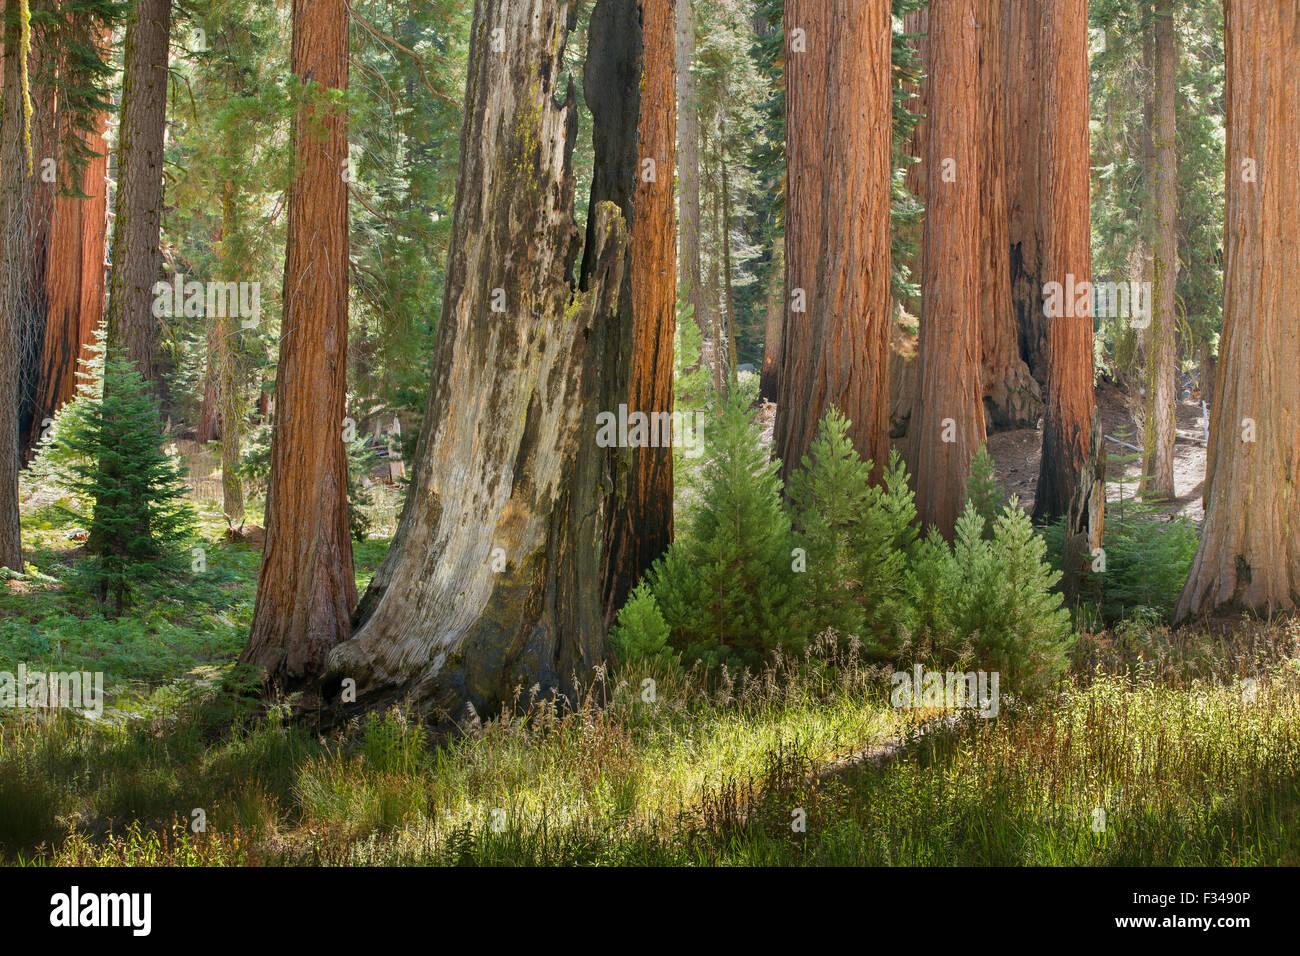 giant sequoia trees in Sequoia National Park, California, USA - Stock Image